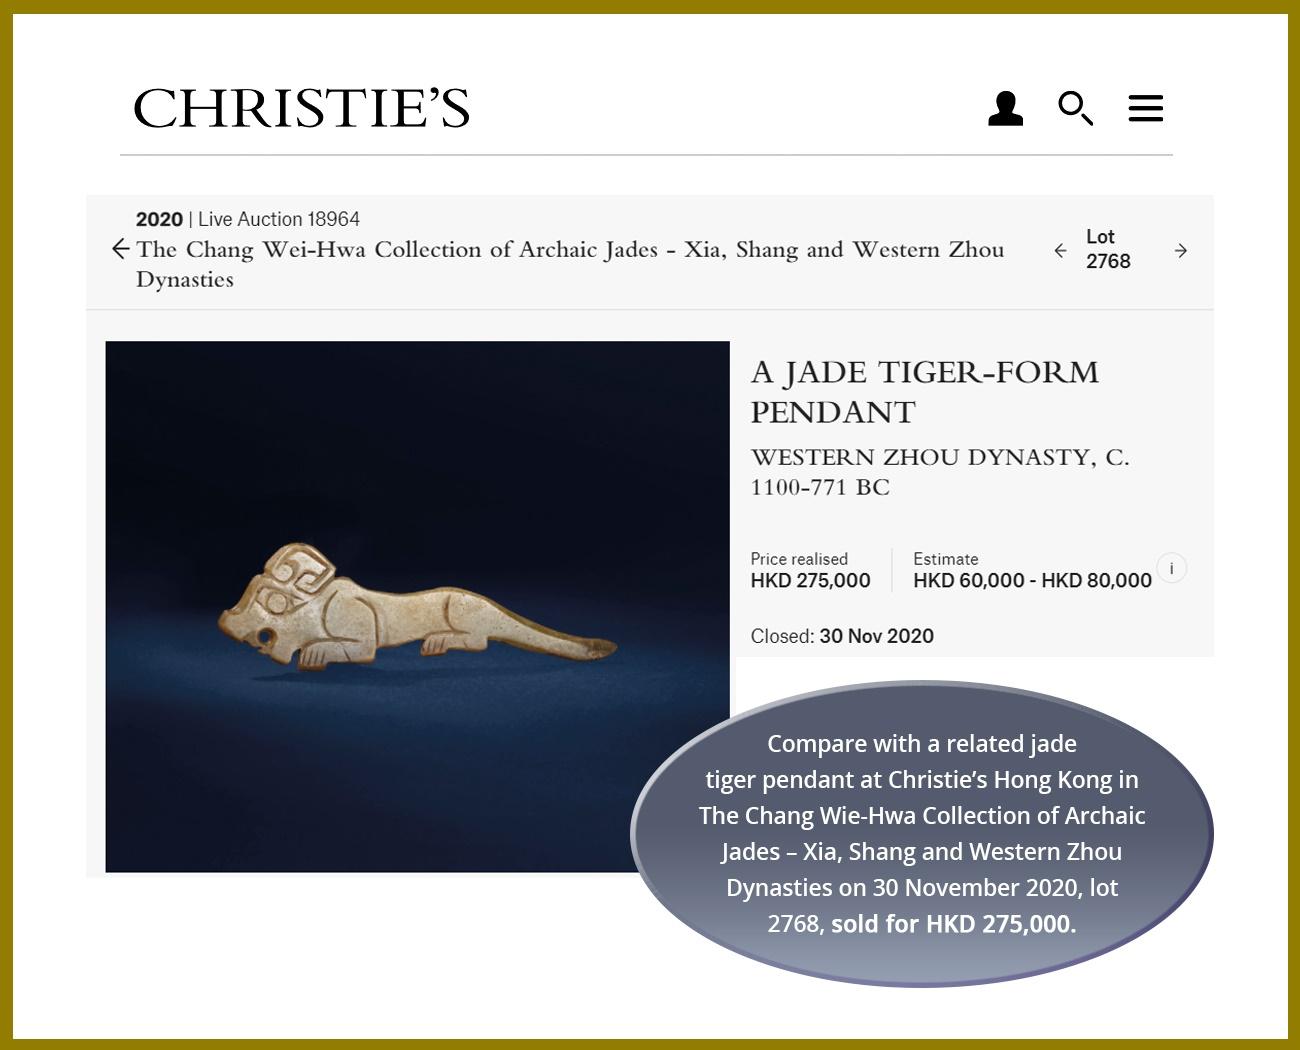 A CELADON JADE 'CROUCHING TIGER' PENDANT, WESTERN ZHOU DYNASTY - Image 6 of 6